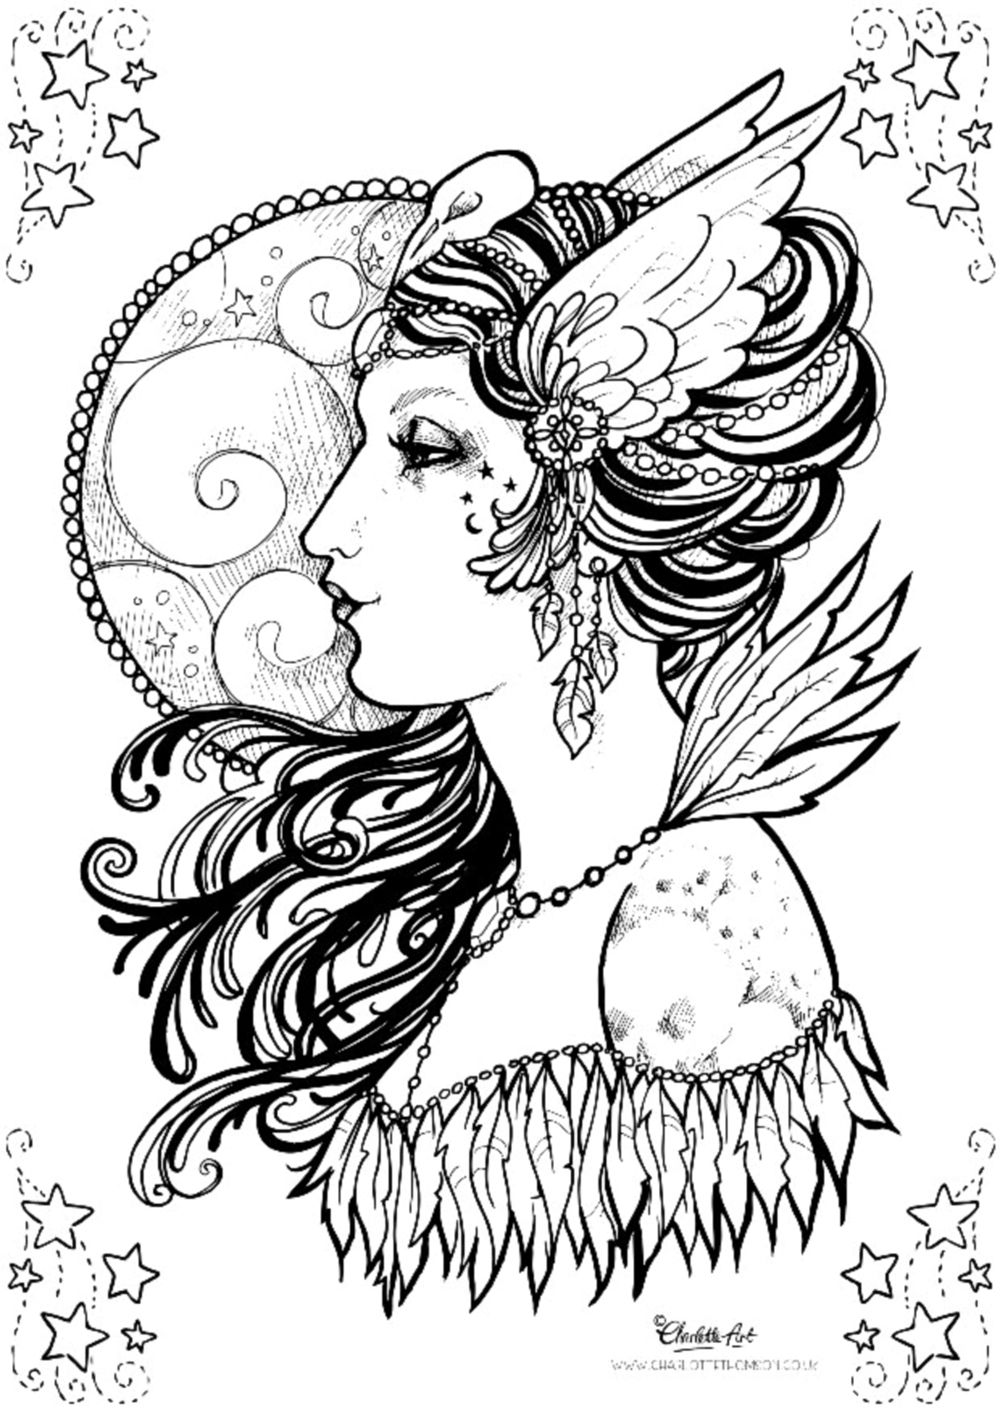 Charlotte Thomson Art Gothic Mystic Raven Crow Victorian Pin Up